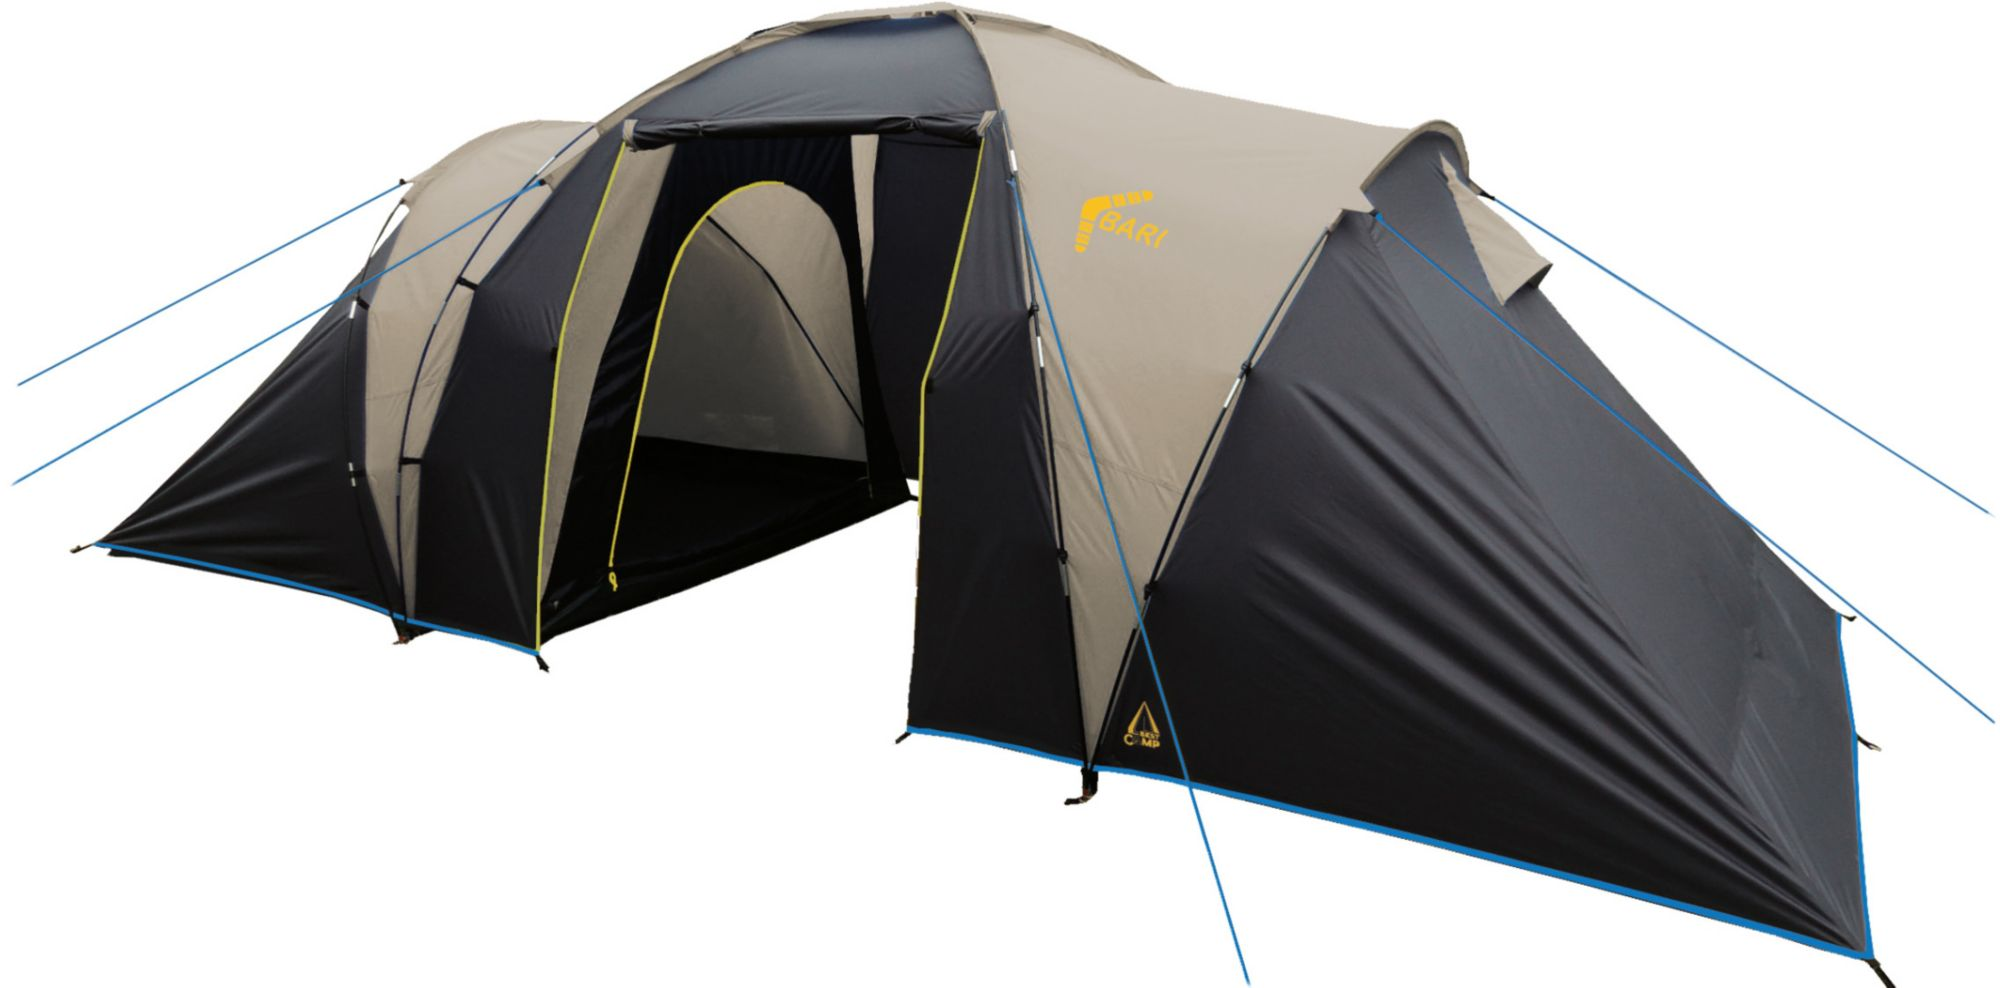 BEST CAMP Best Camp Zelt, 4 Personen, »Bari 4«